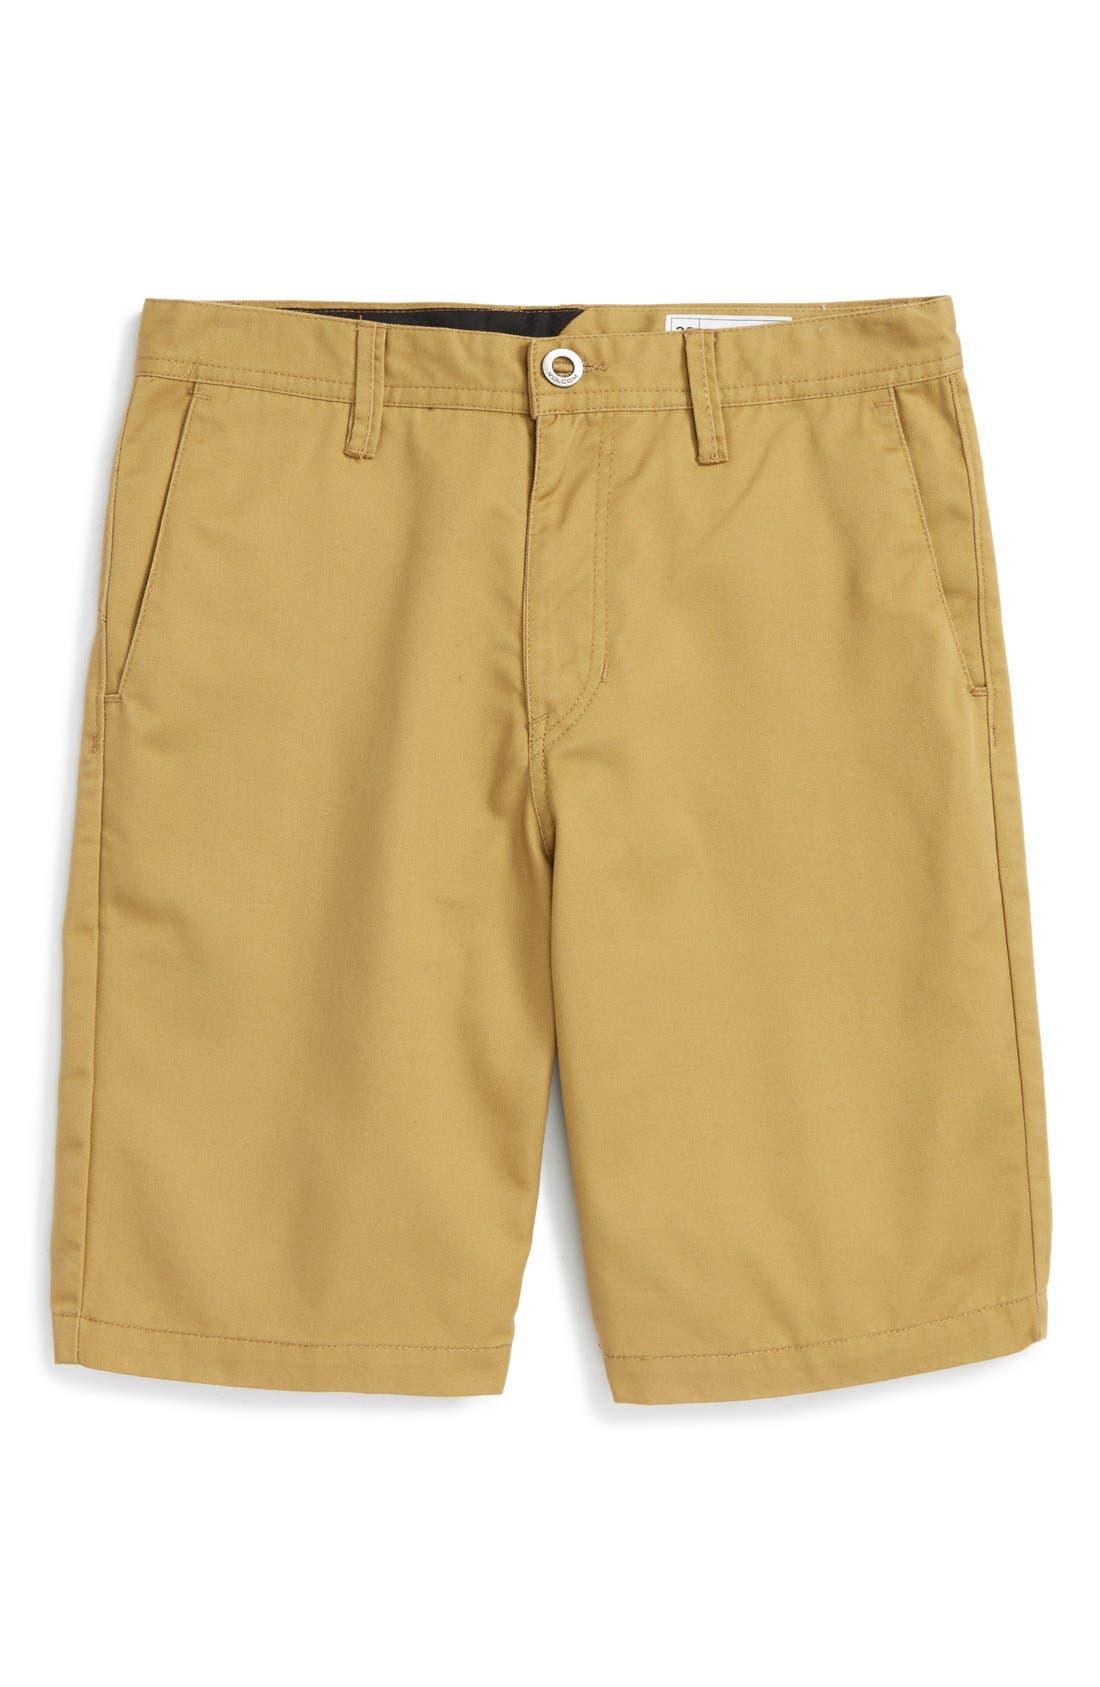 Chino Shorts,                             Main thumbnail 1, color,                             KHAKI DARK